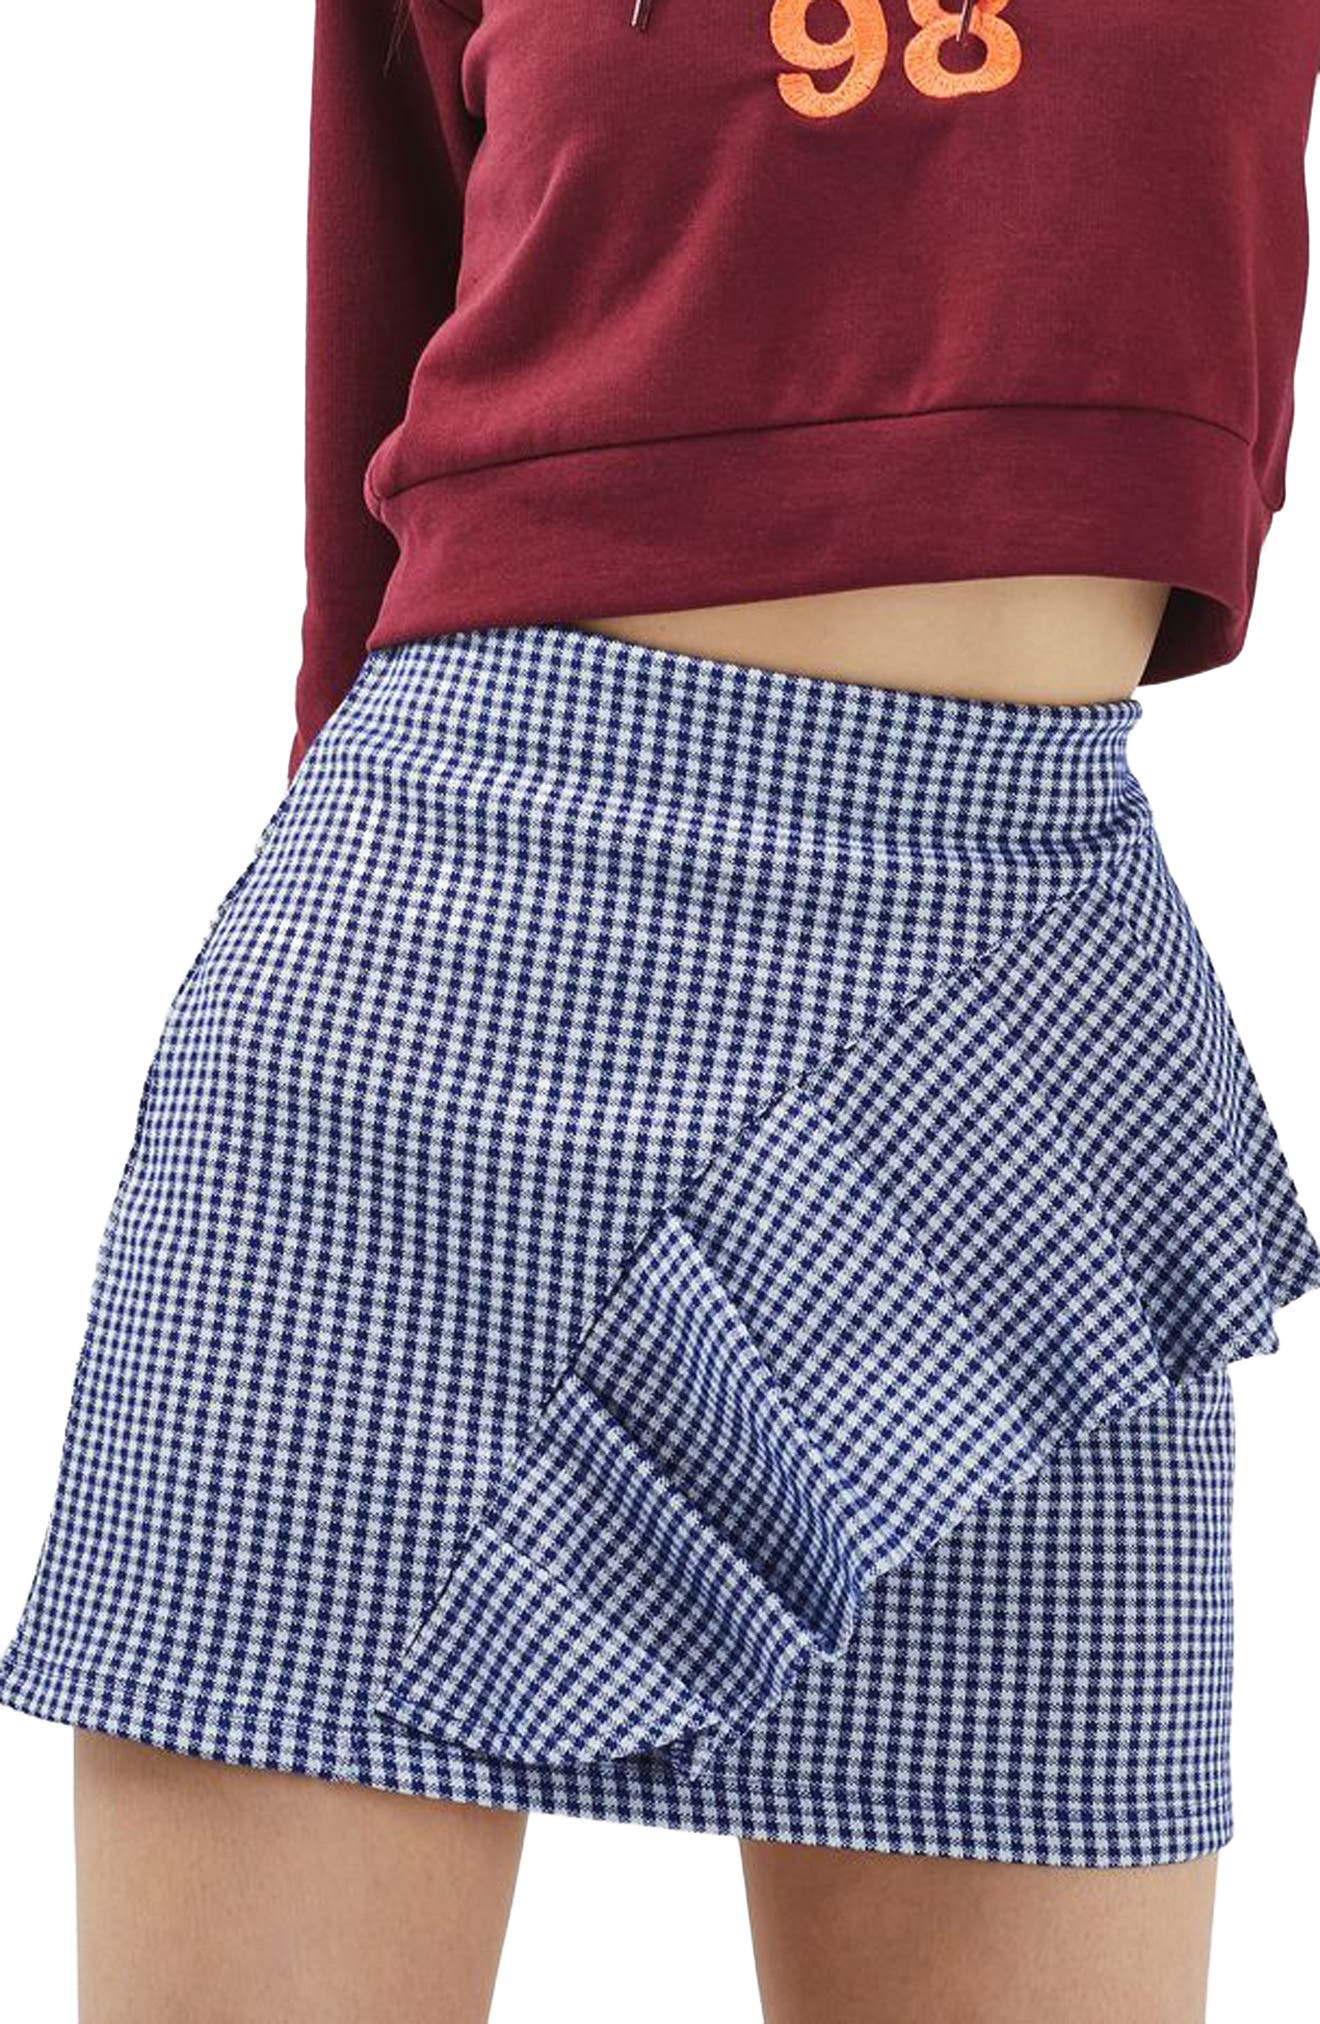 Alternate Image 1 Selected - Topshop Gingham Ruffle Miniskirt